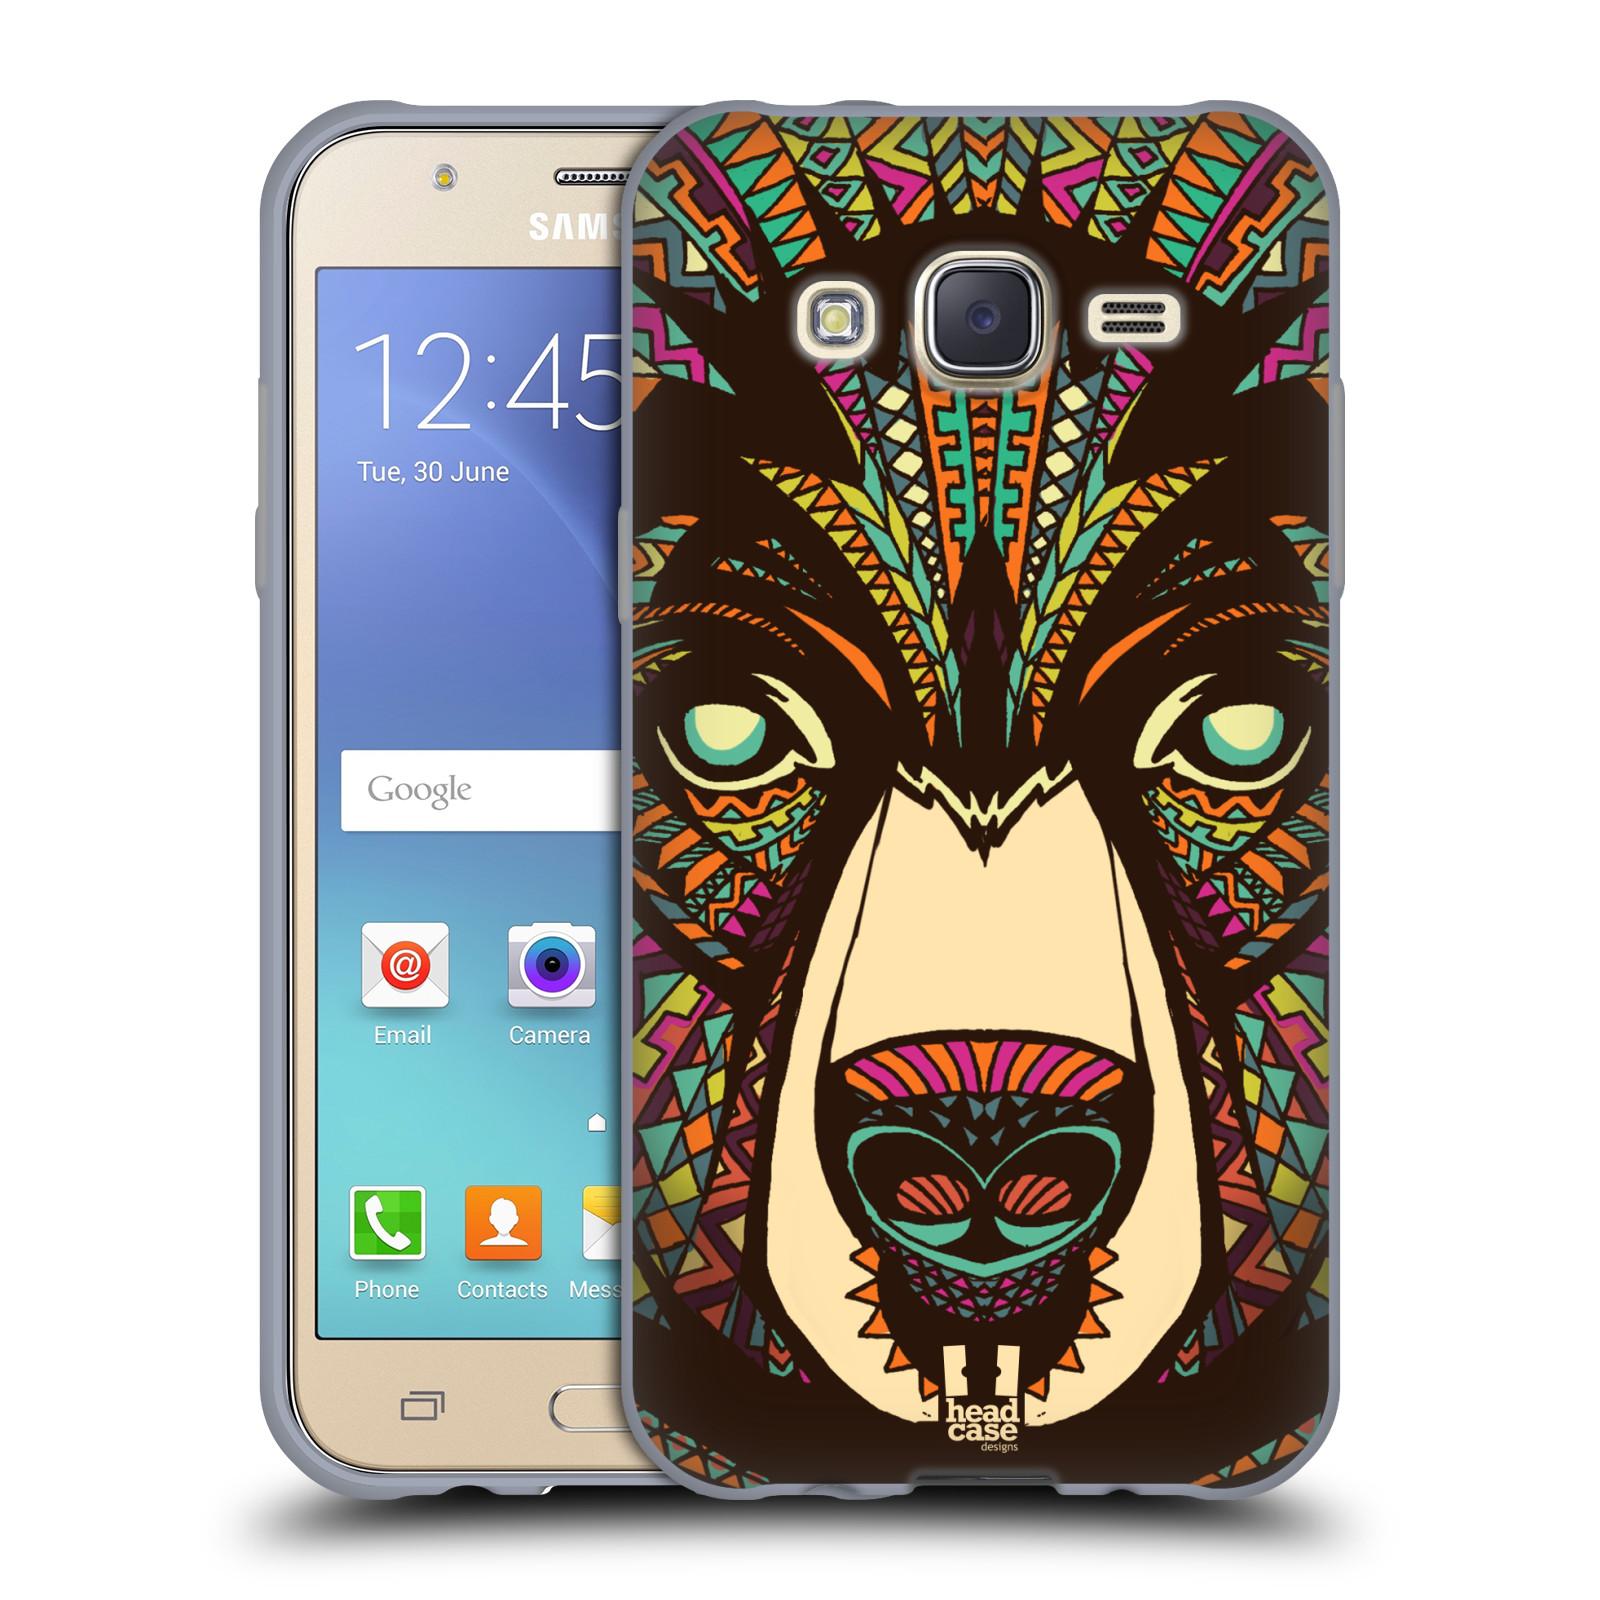 HEAD CASE silikonový obal na mobil Samsung Galaxy J5, J500, (J5 DUOS) vzor Aztécký motiv zvíře medvěd